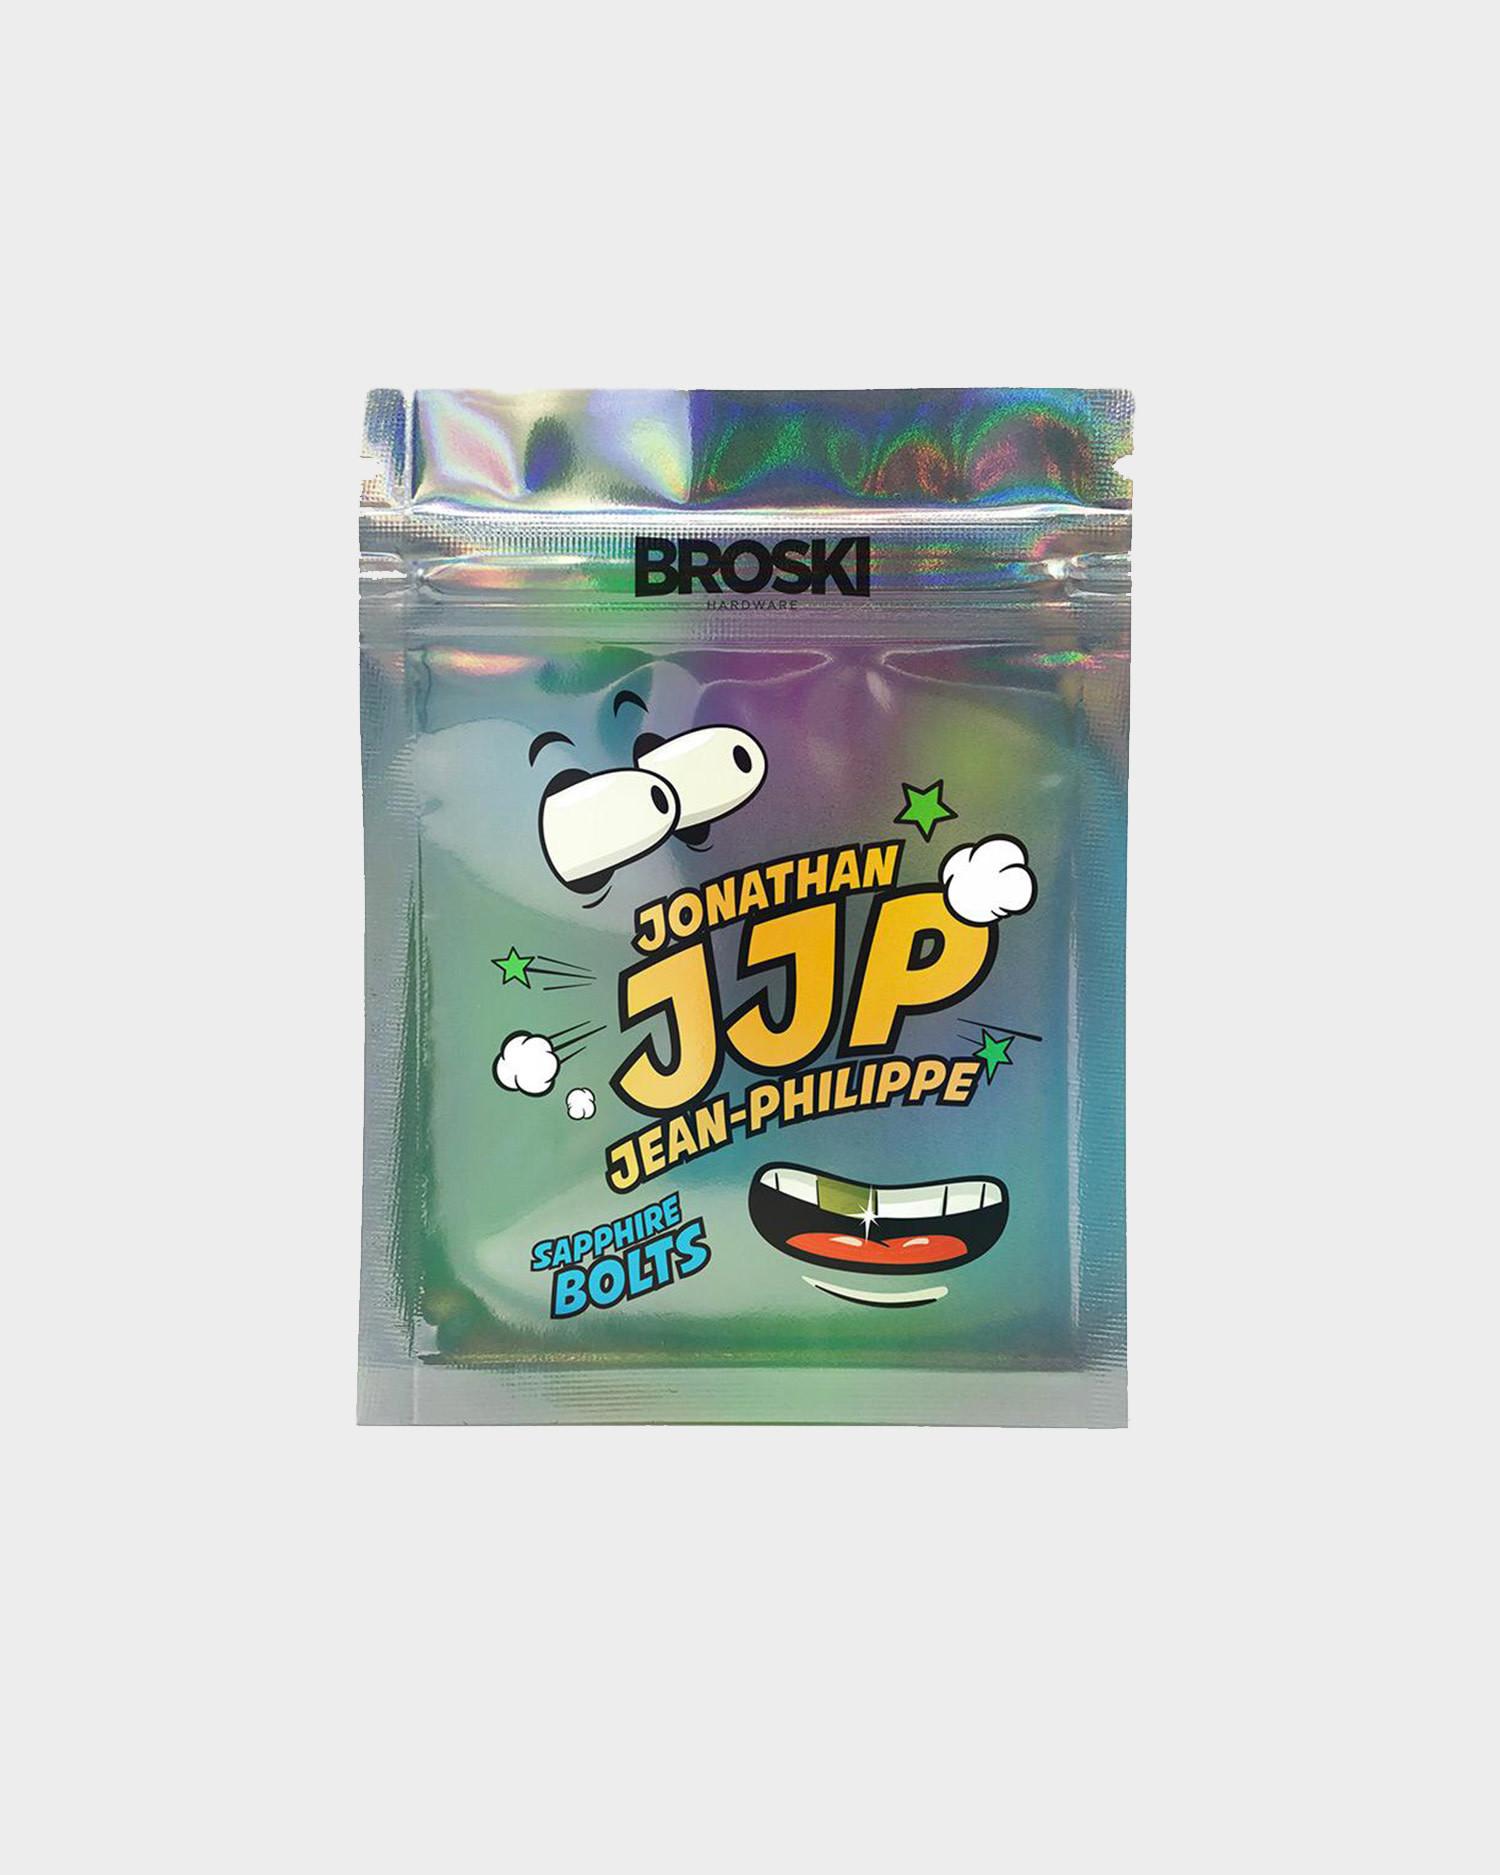 "Broski Hardware JJP 1"" Sapphire"